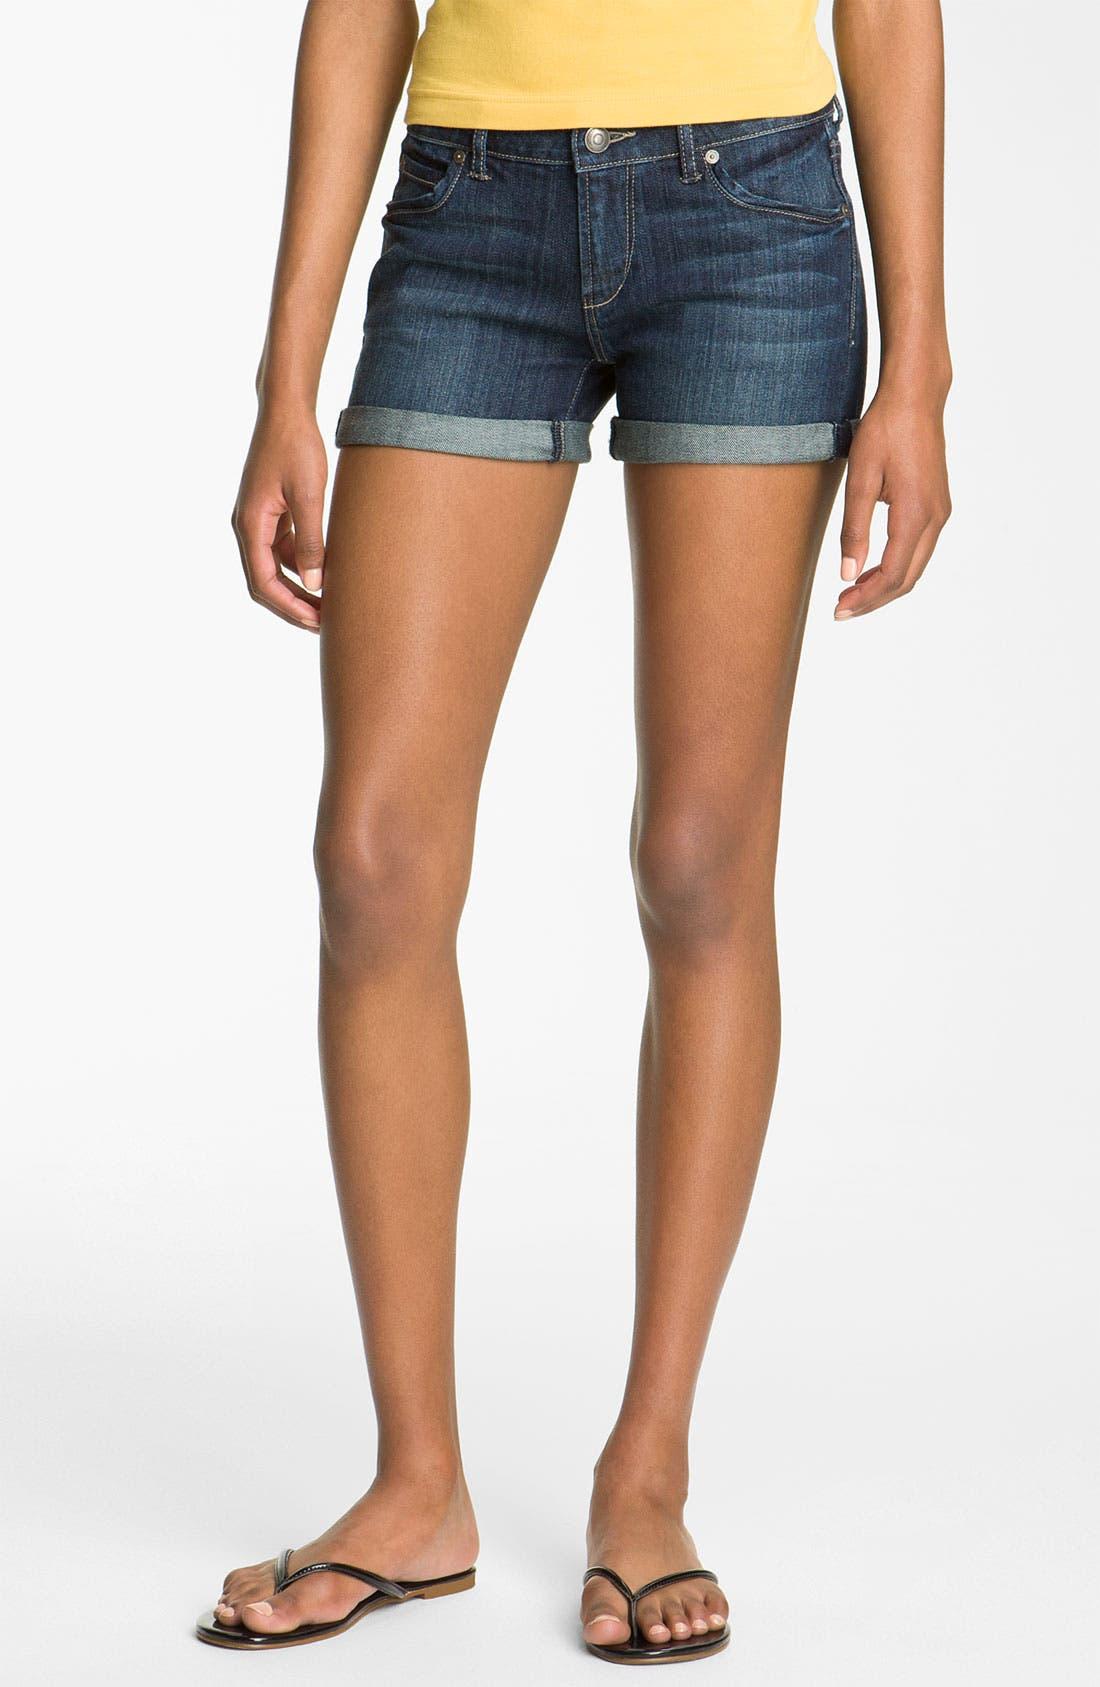 Alternate Image 1 Selected - Articles of Society 'Kara' Cuff Denim Shorts (Storm) (Juniors)